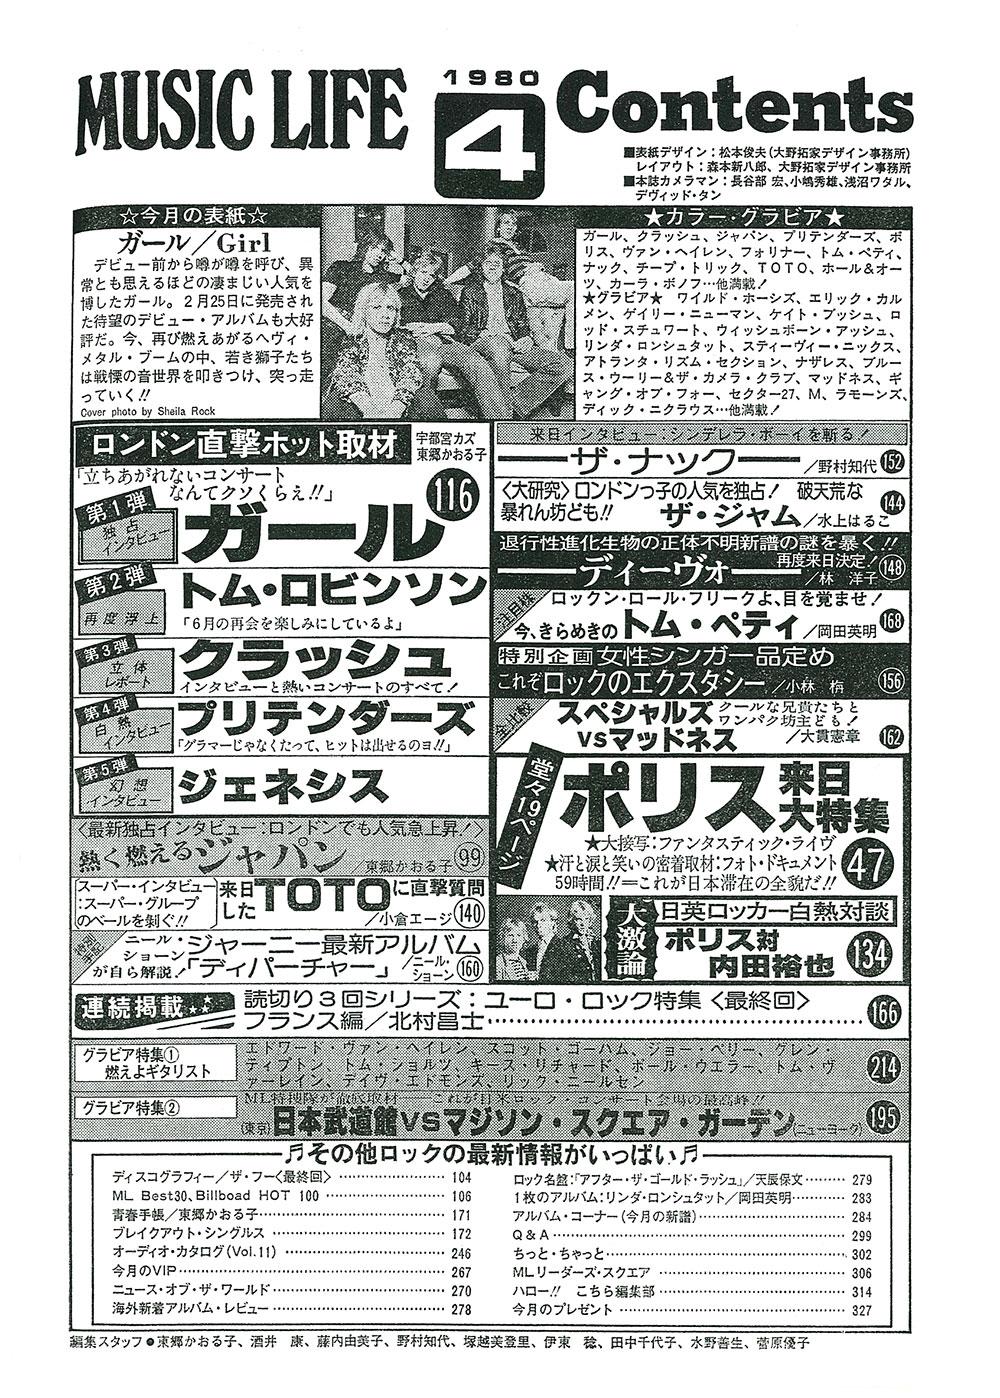 MUSIC LIFE 1980年4月号目次